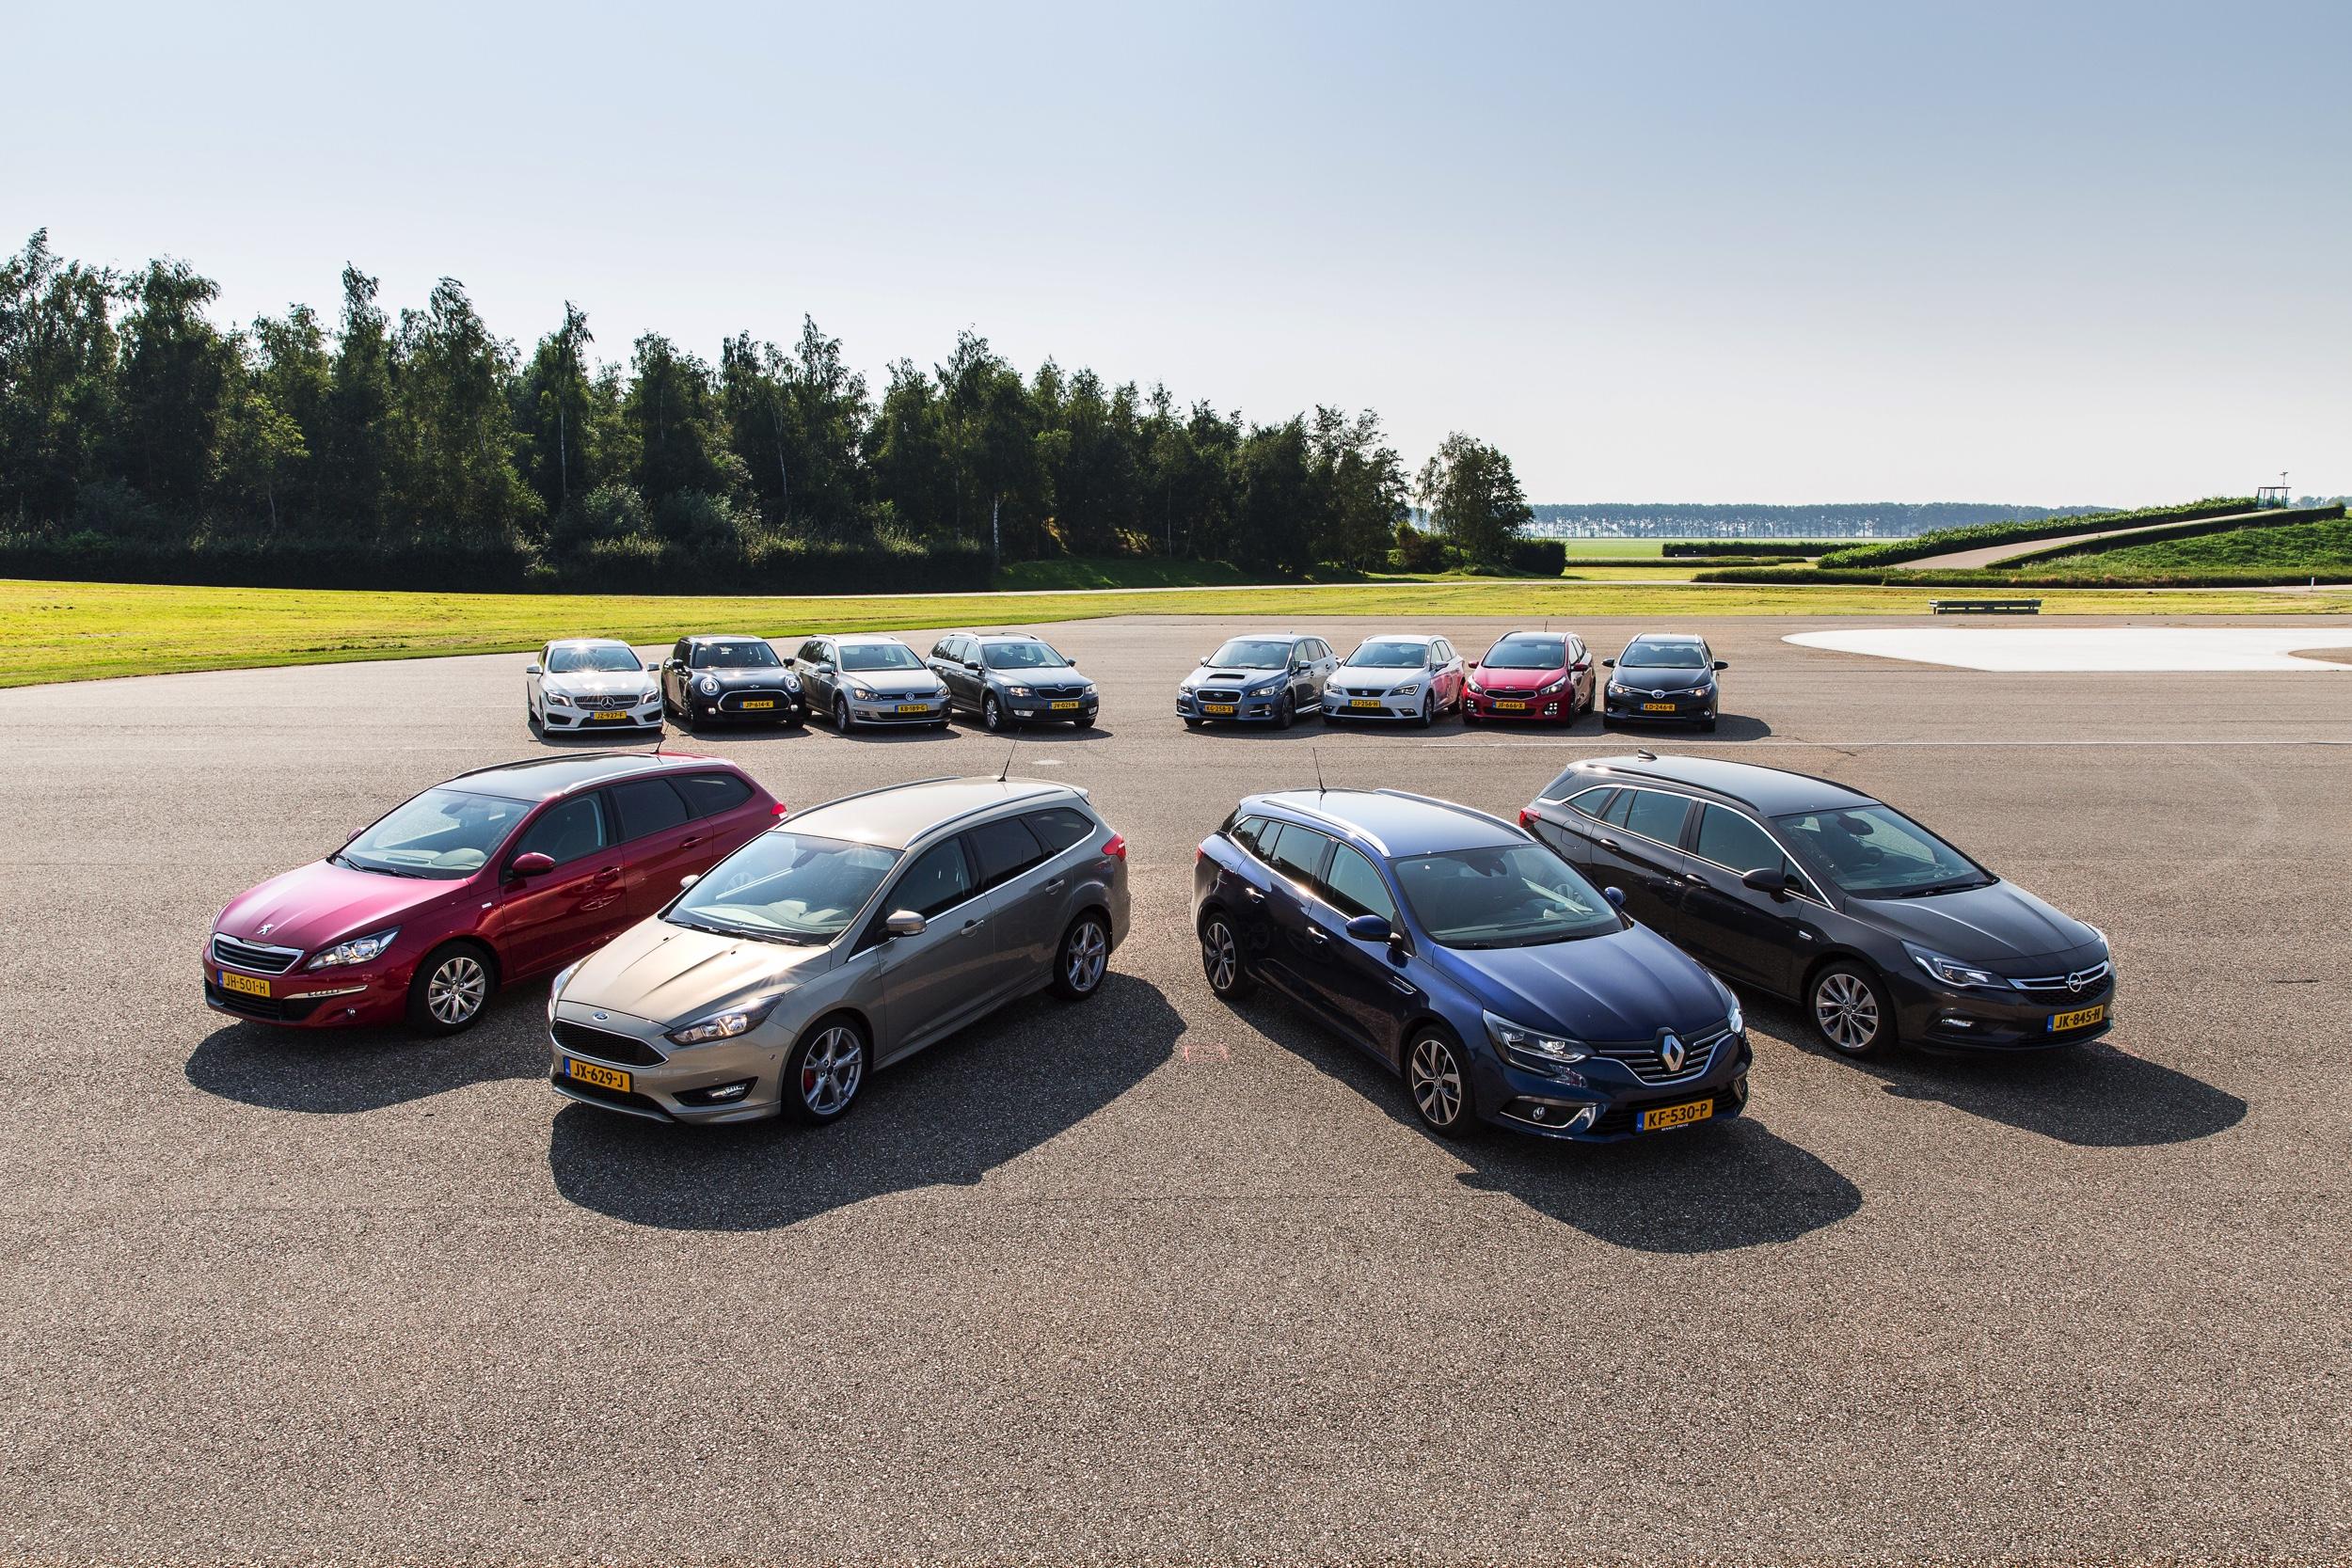 Autovisie Magazine 24 -4- Sneak Preview - De grootste autotest van Nederland - Martijn Bravenboer